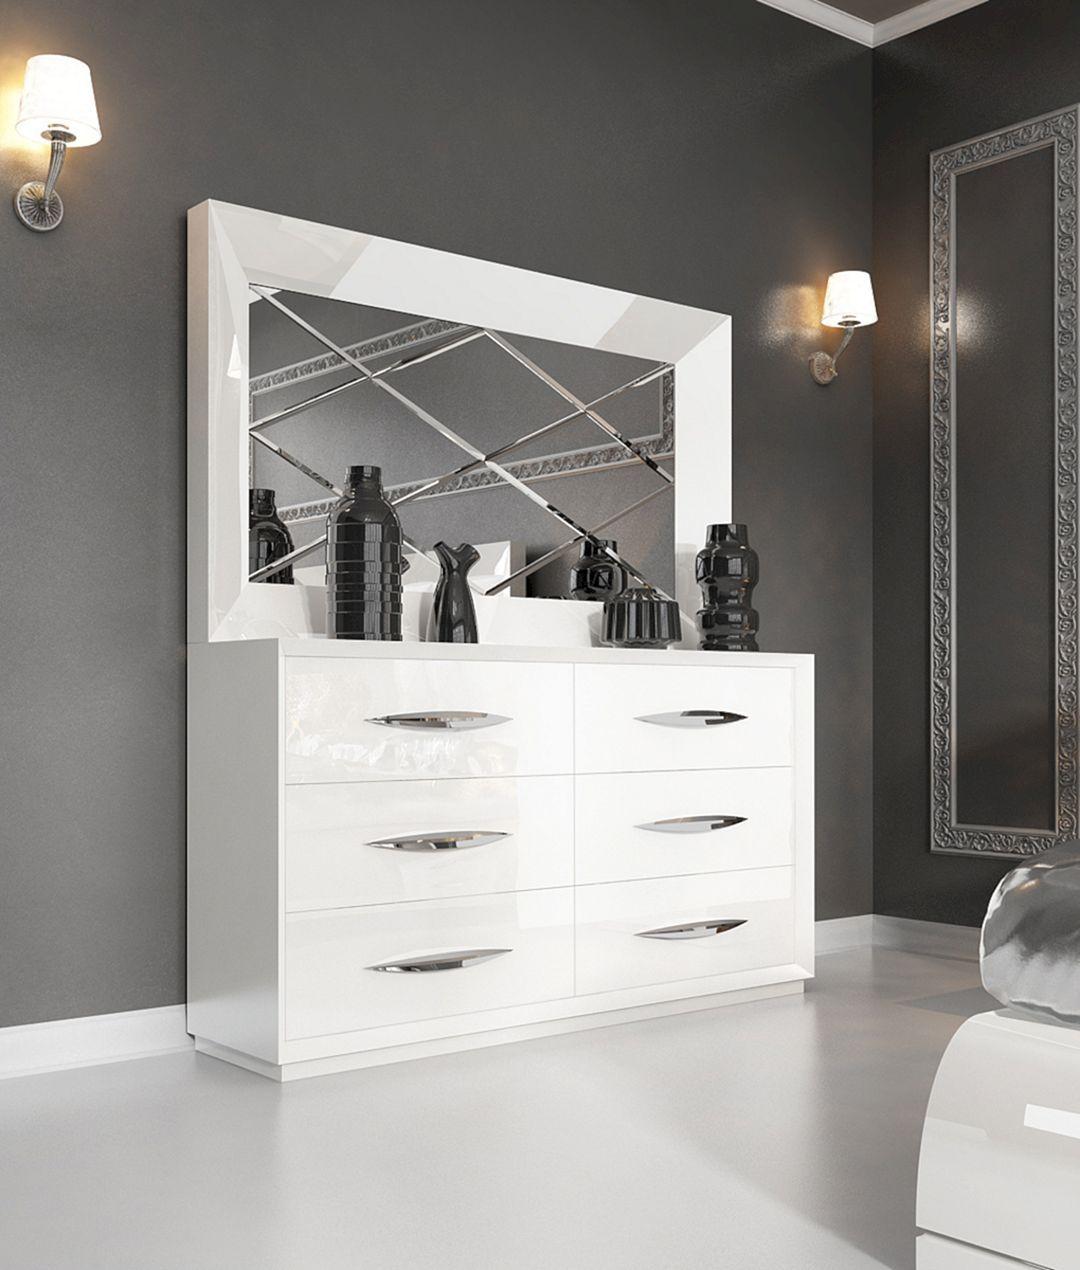 Bedroom Dressers With Mirrors 1 Decorathing Mobilier De Chambre Commode Miroir Meubles De Chambre Moderne